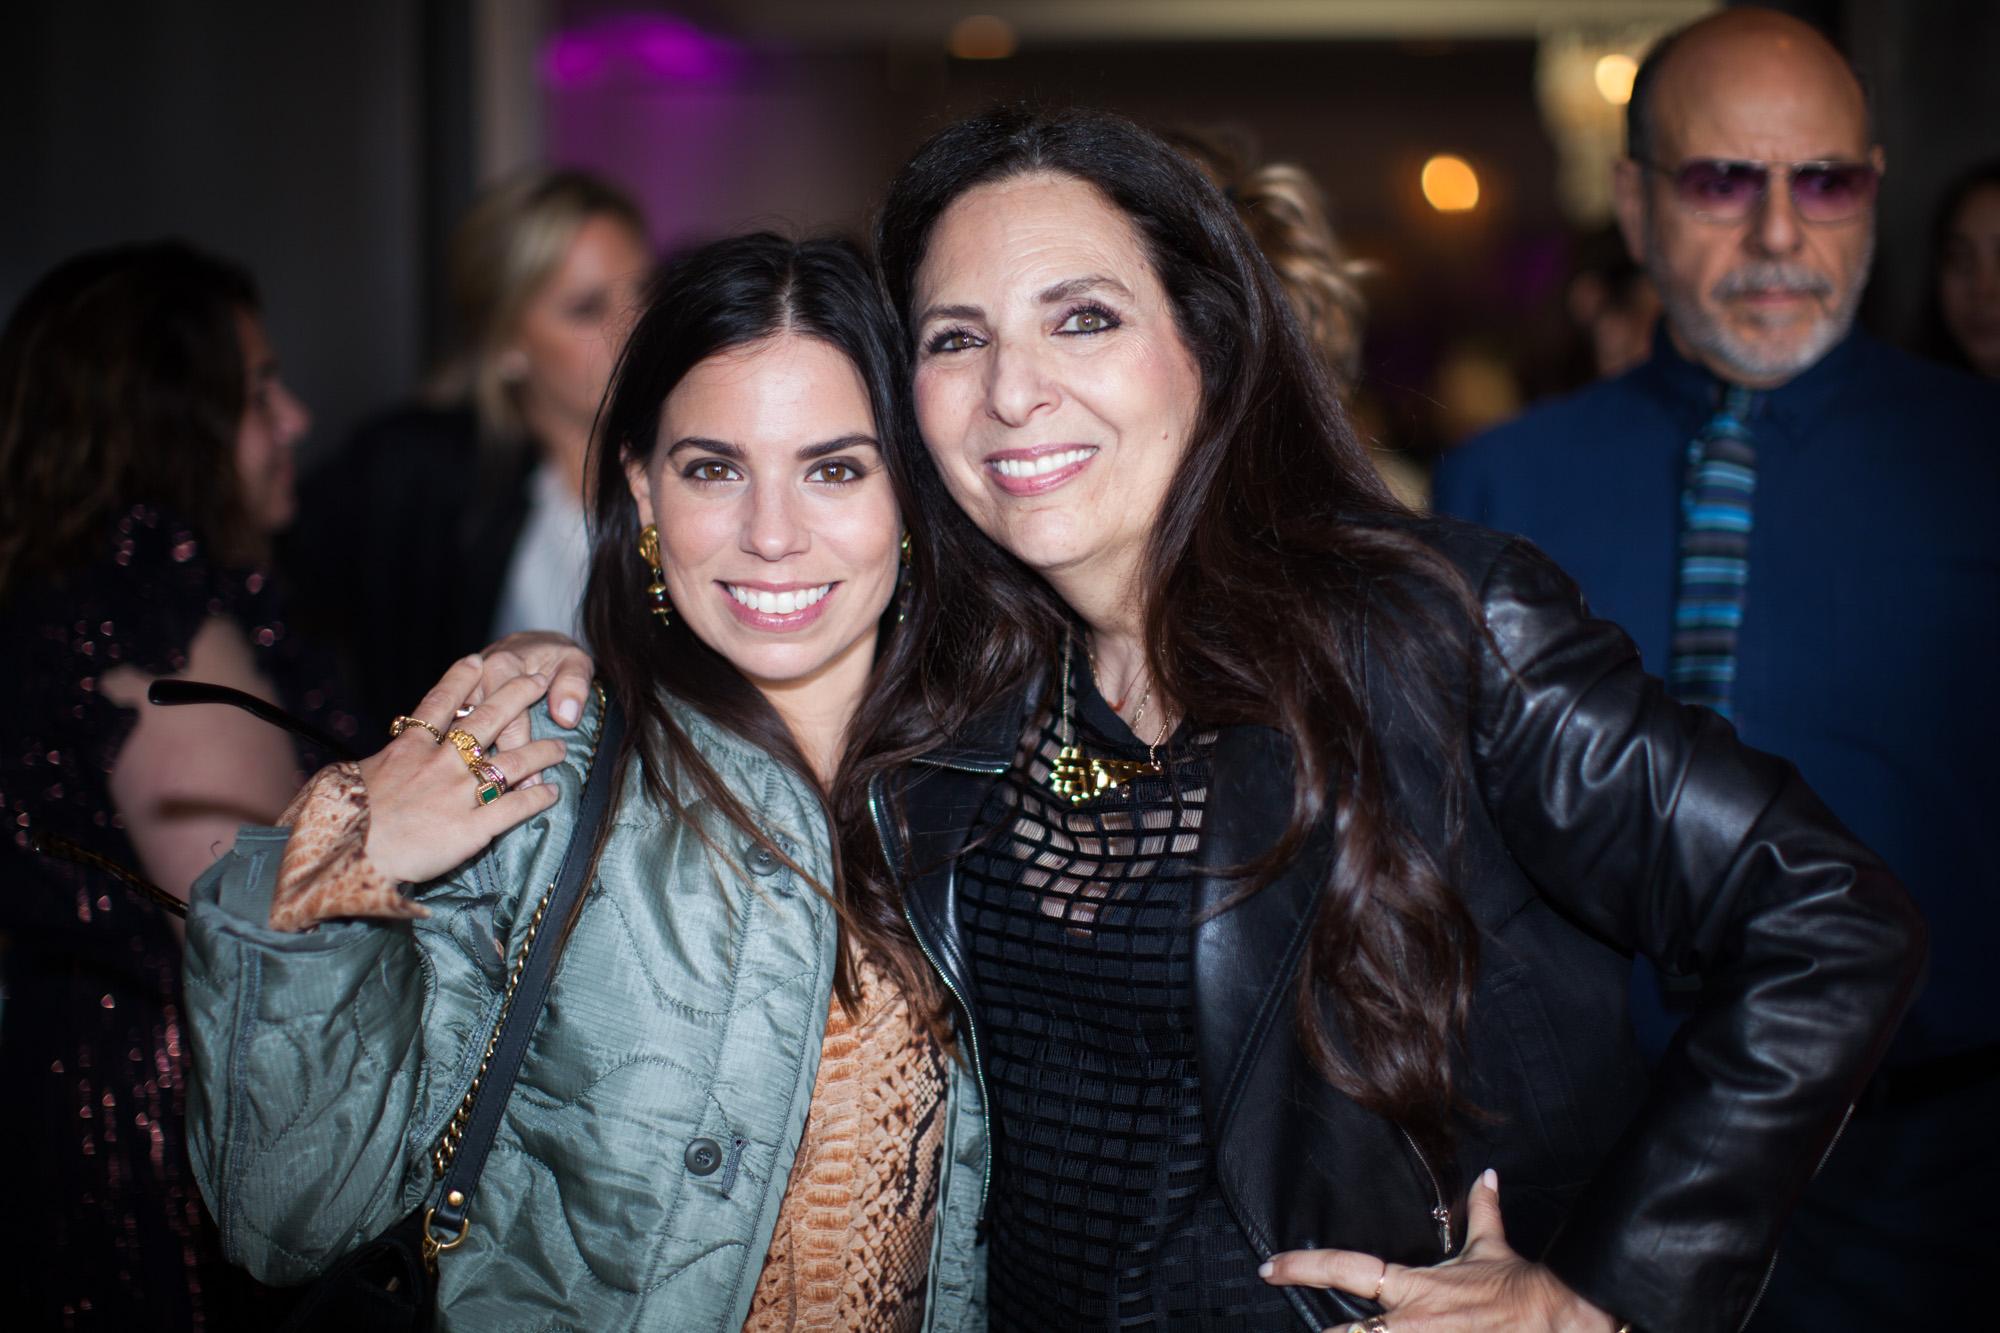 Cofounder Sharon Feldstein with Ally Hilfiger